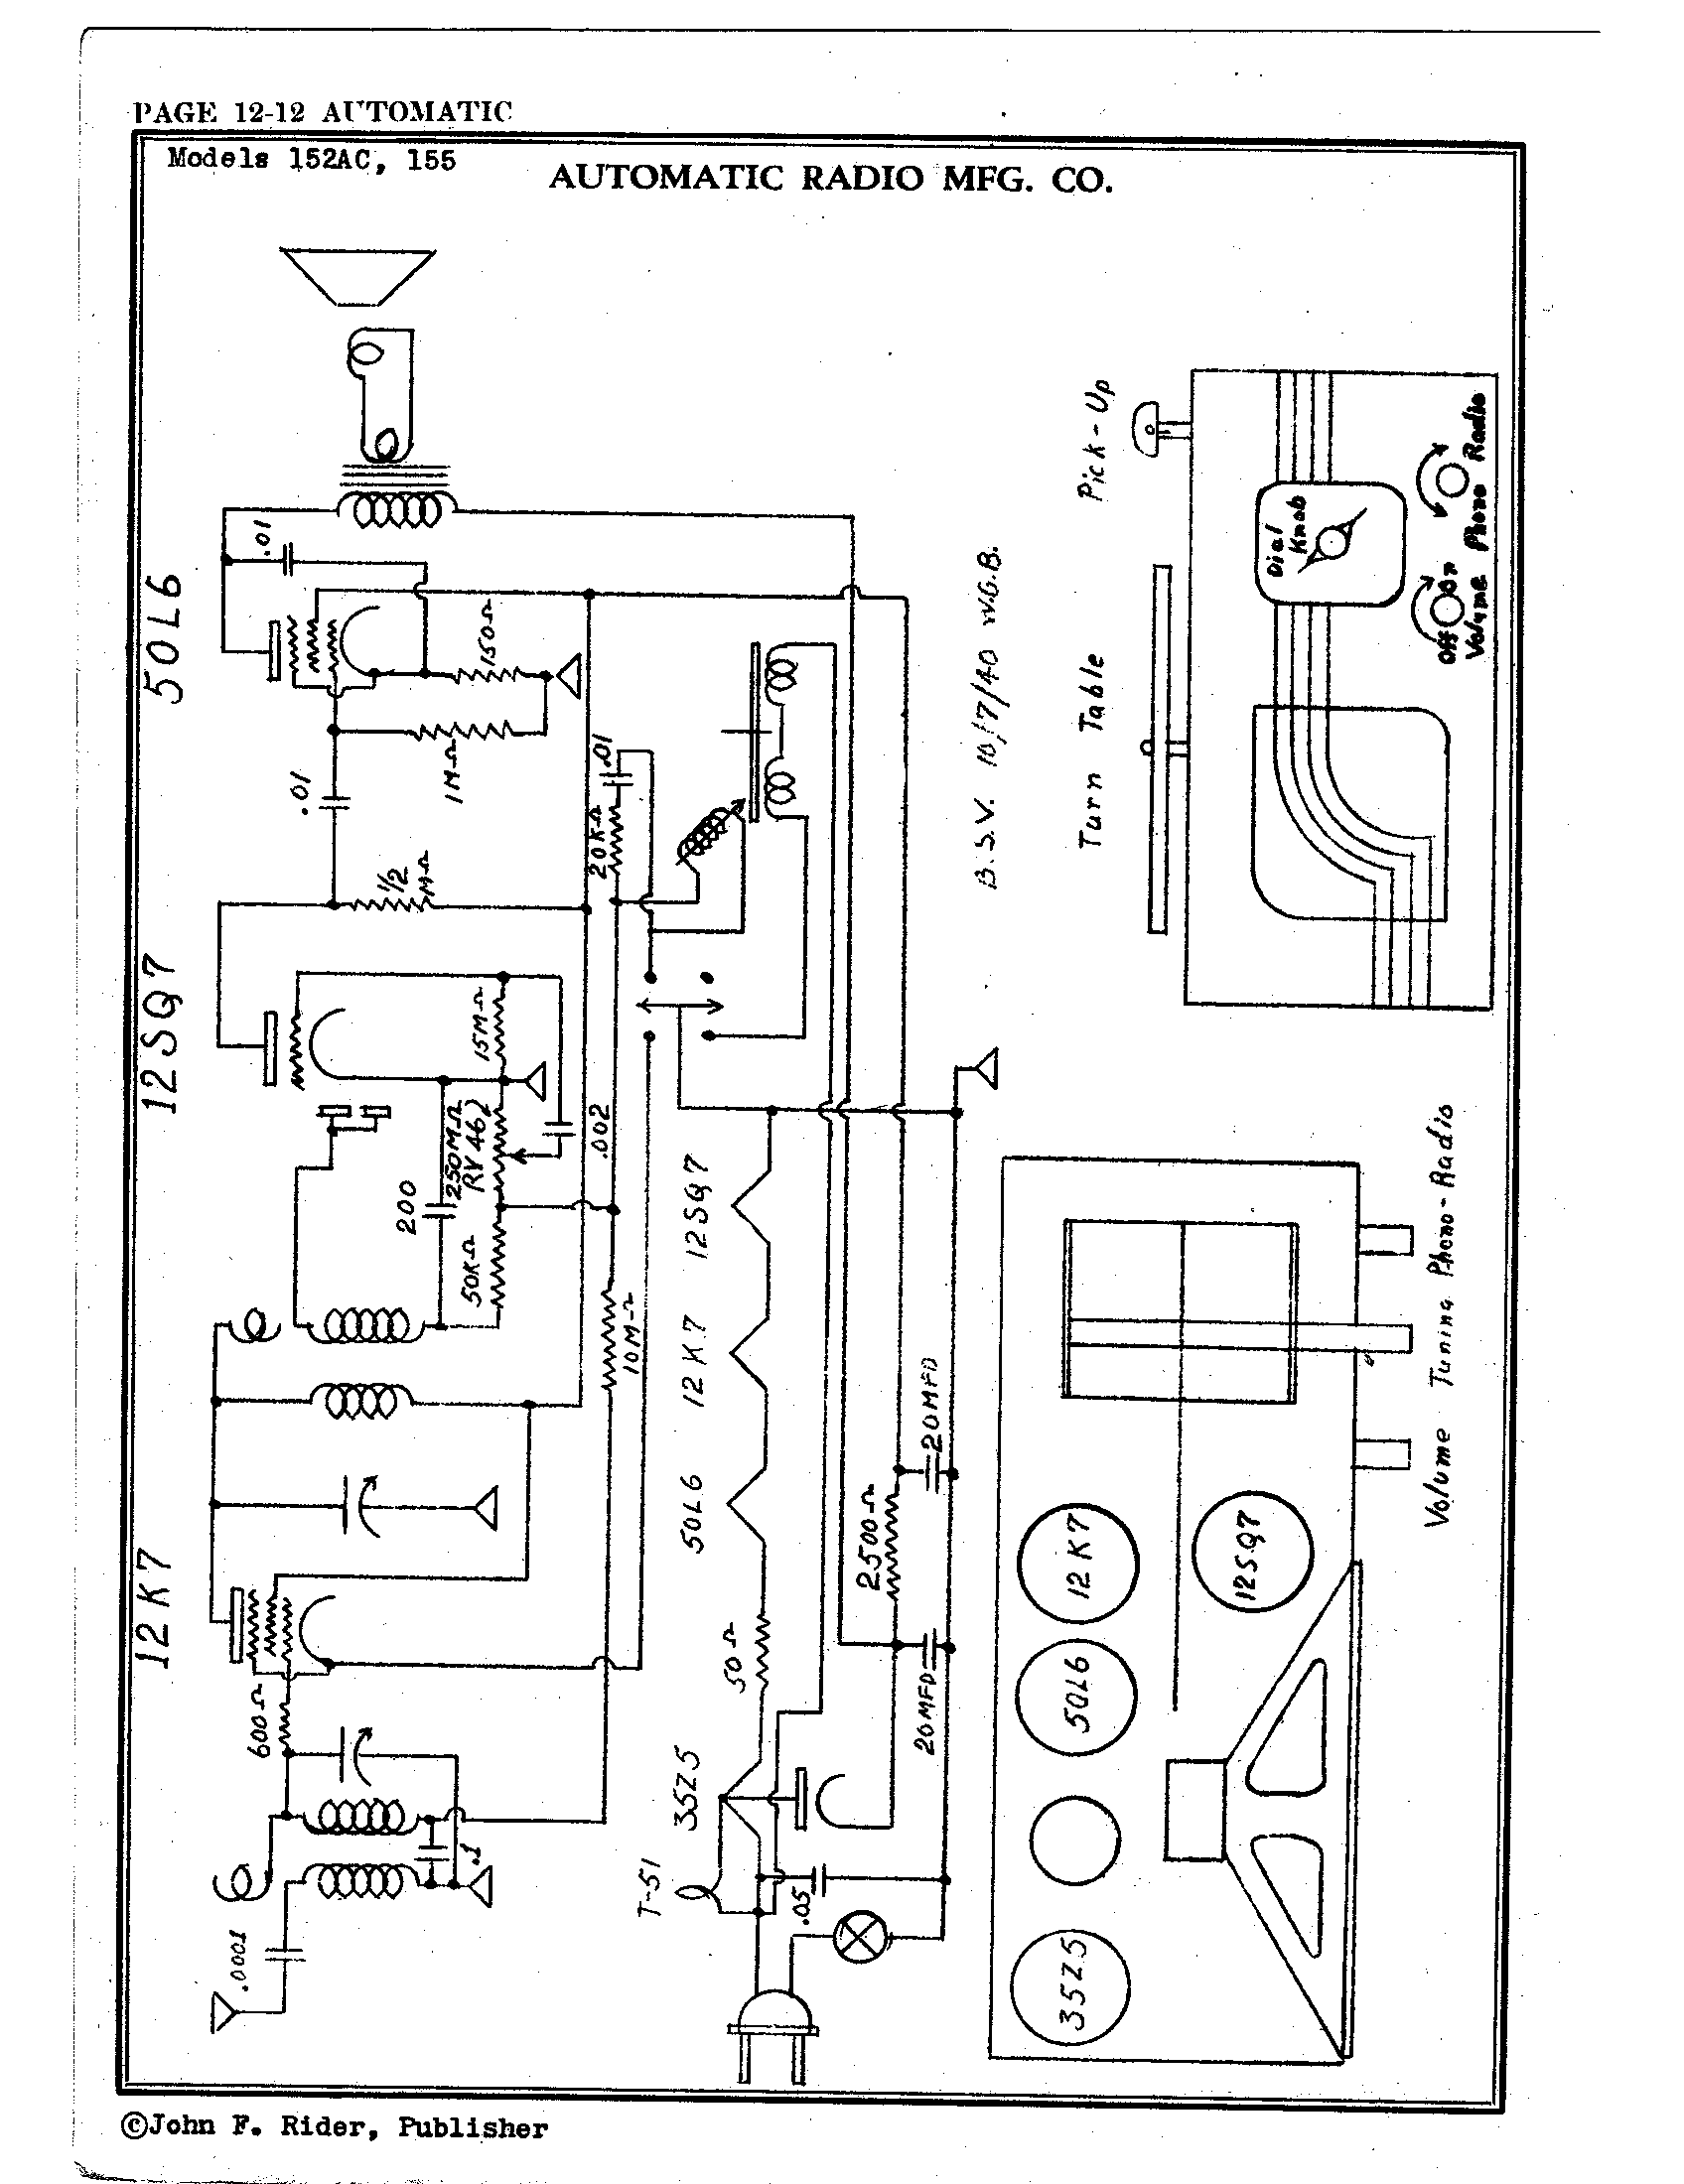 automatic radio mfg  co  155